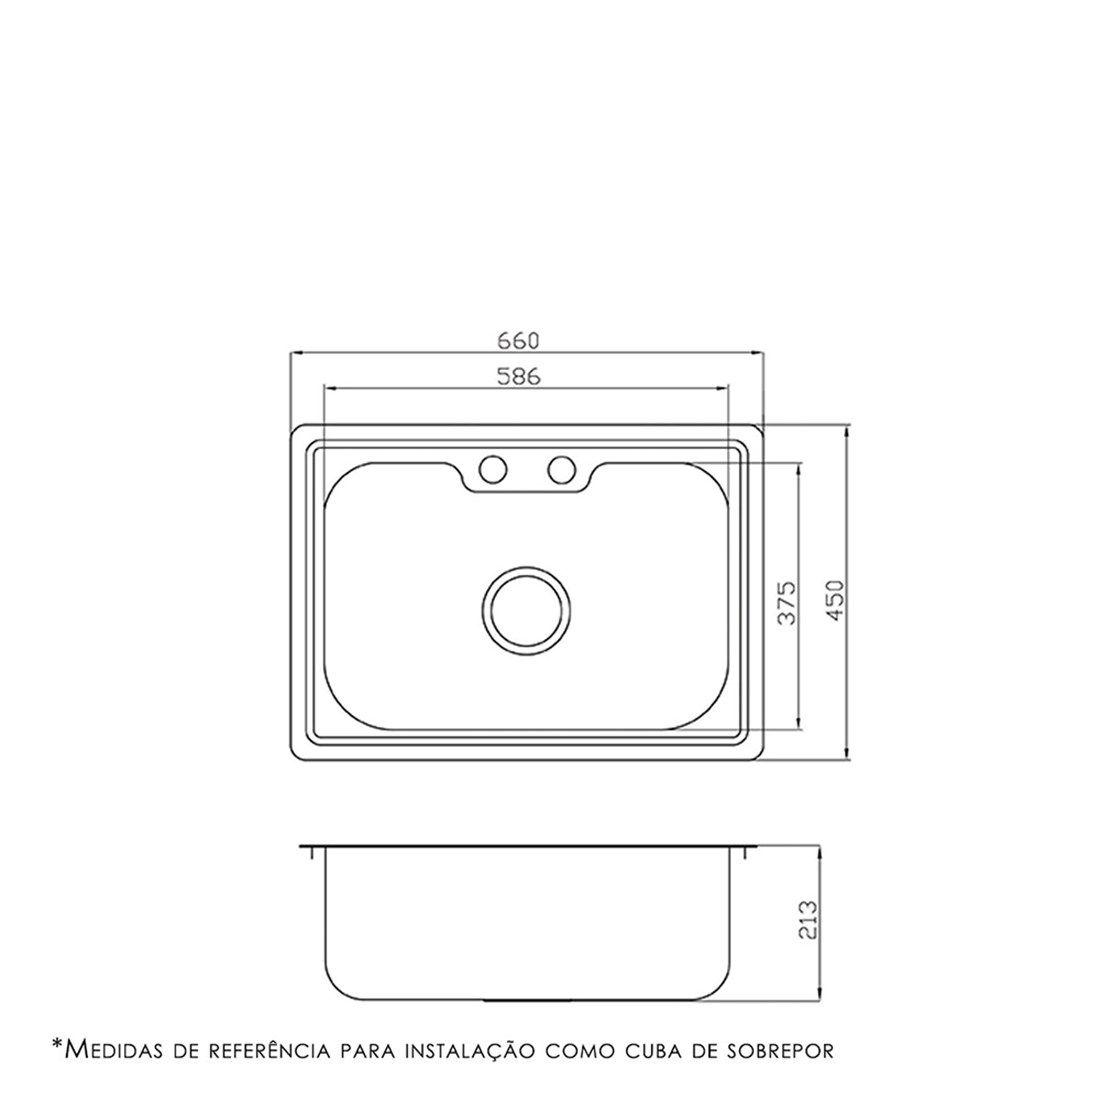 Cuba para Cozinha DeBacco Funzionale Inox 66x45